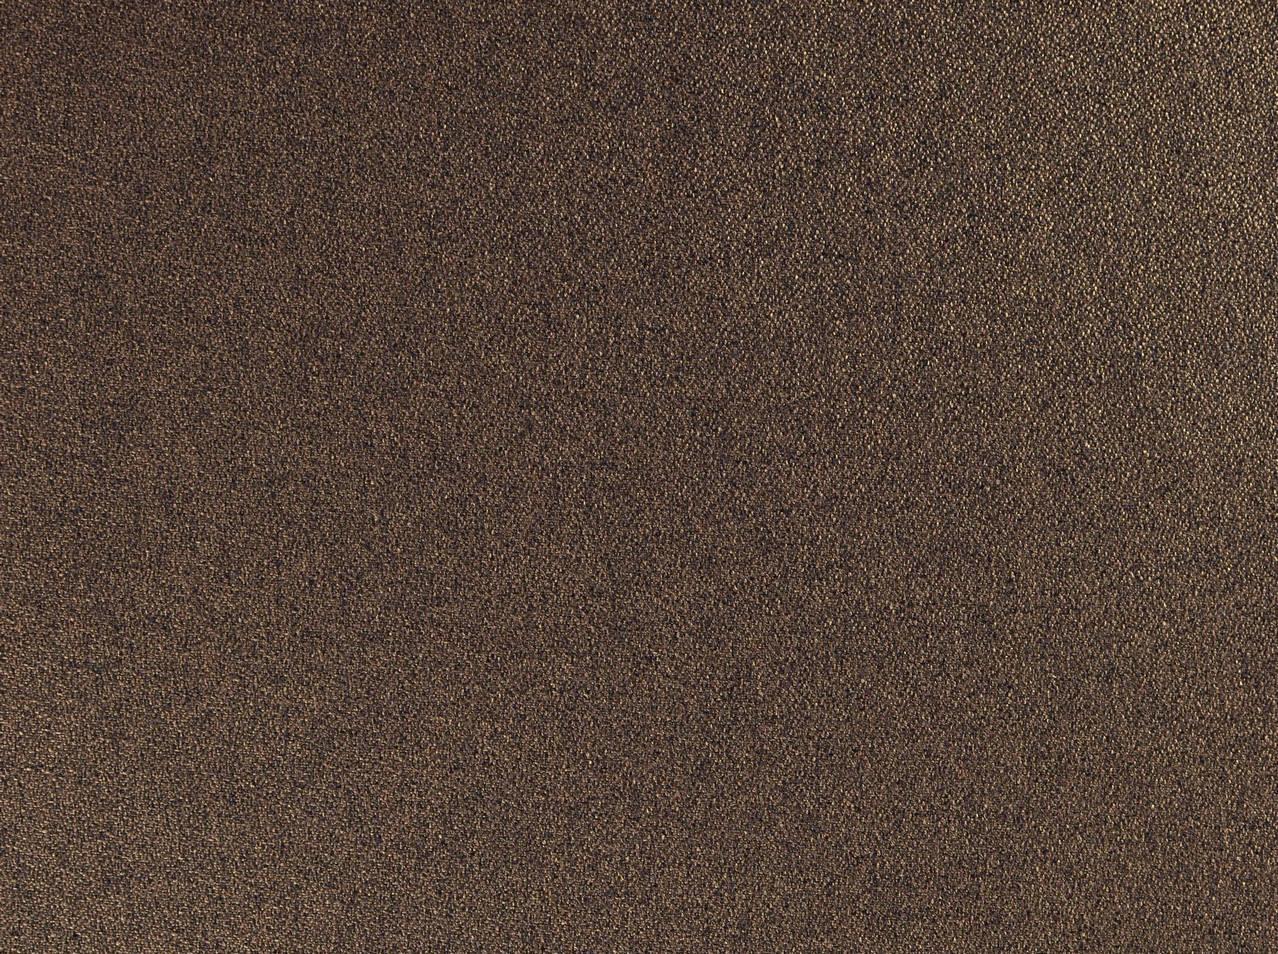 Covington Contract Products Design Style Texture Republic Sable